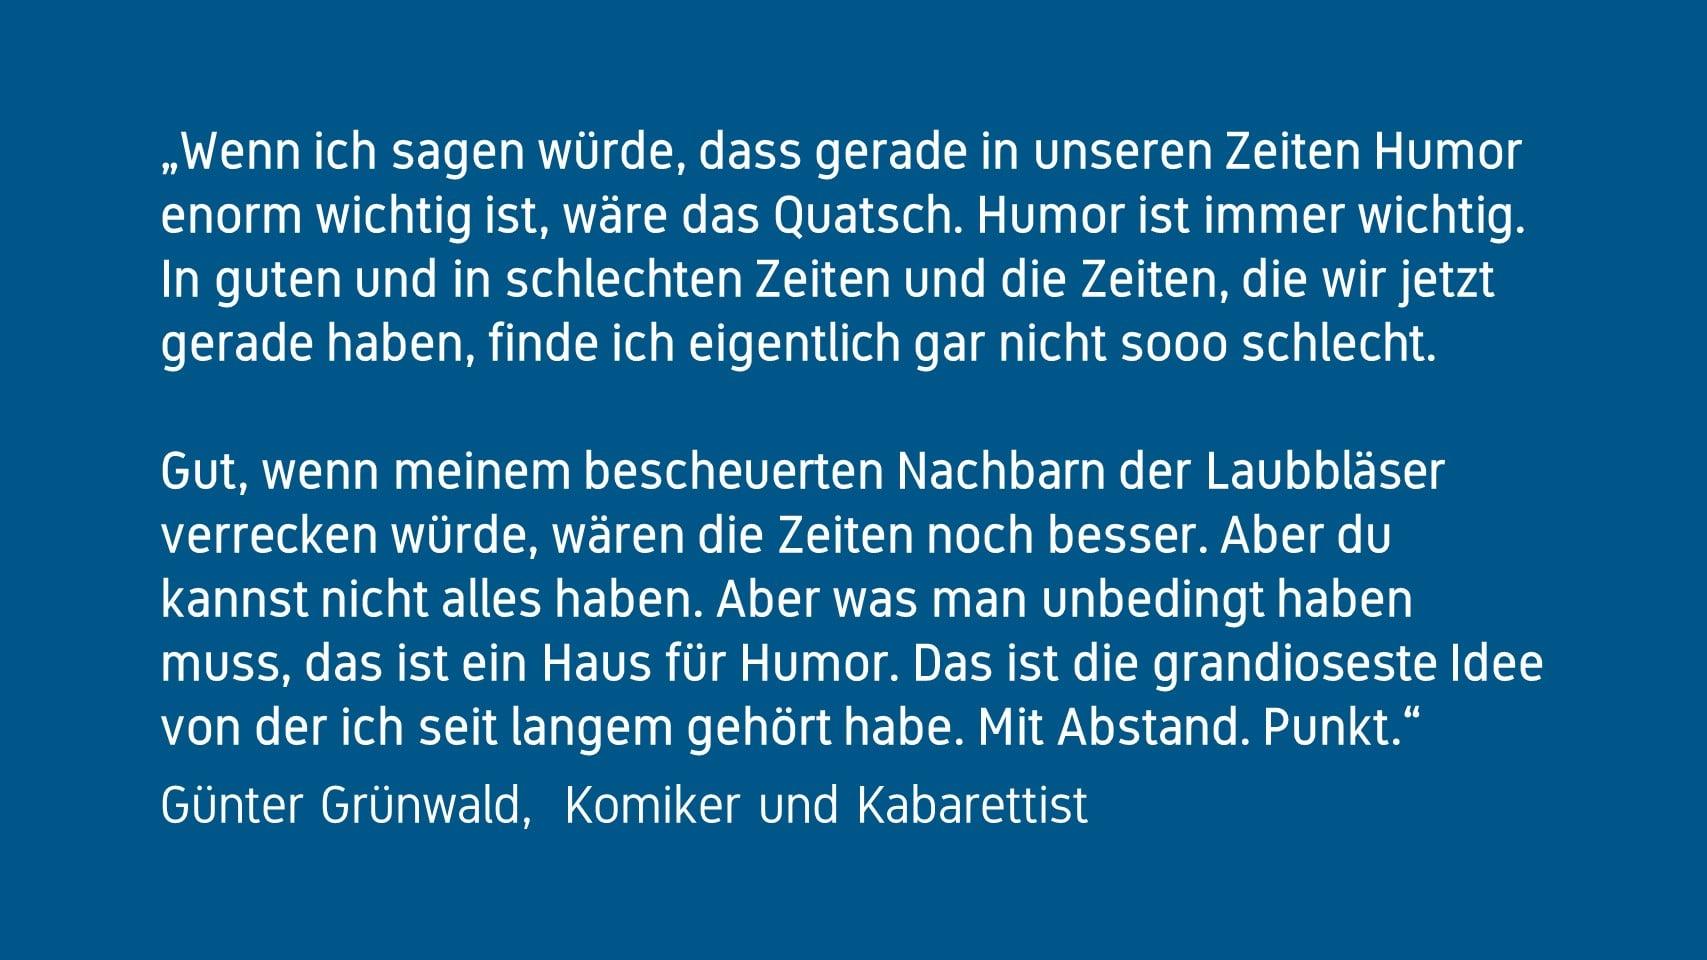 Günter Grünwald Forum Humor